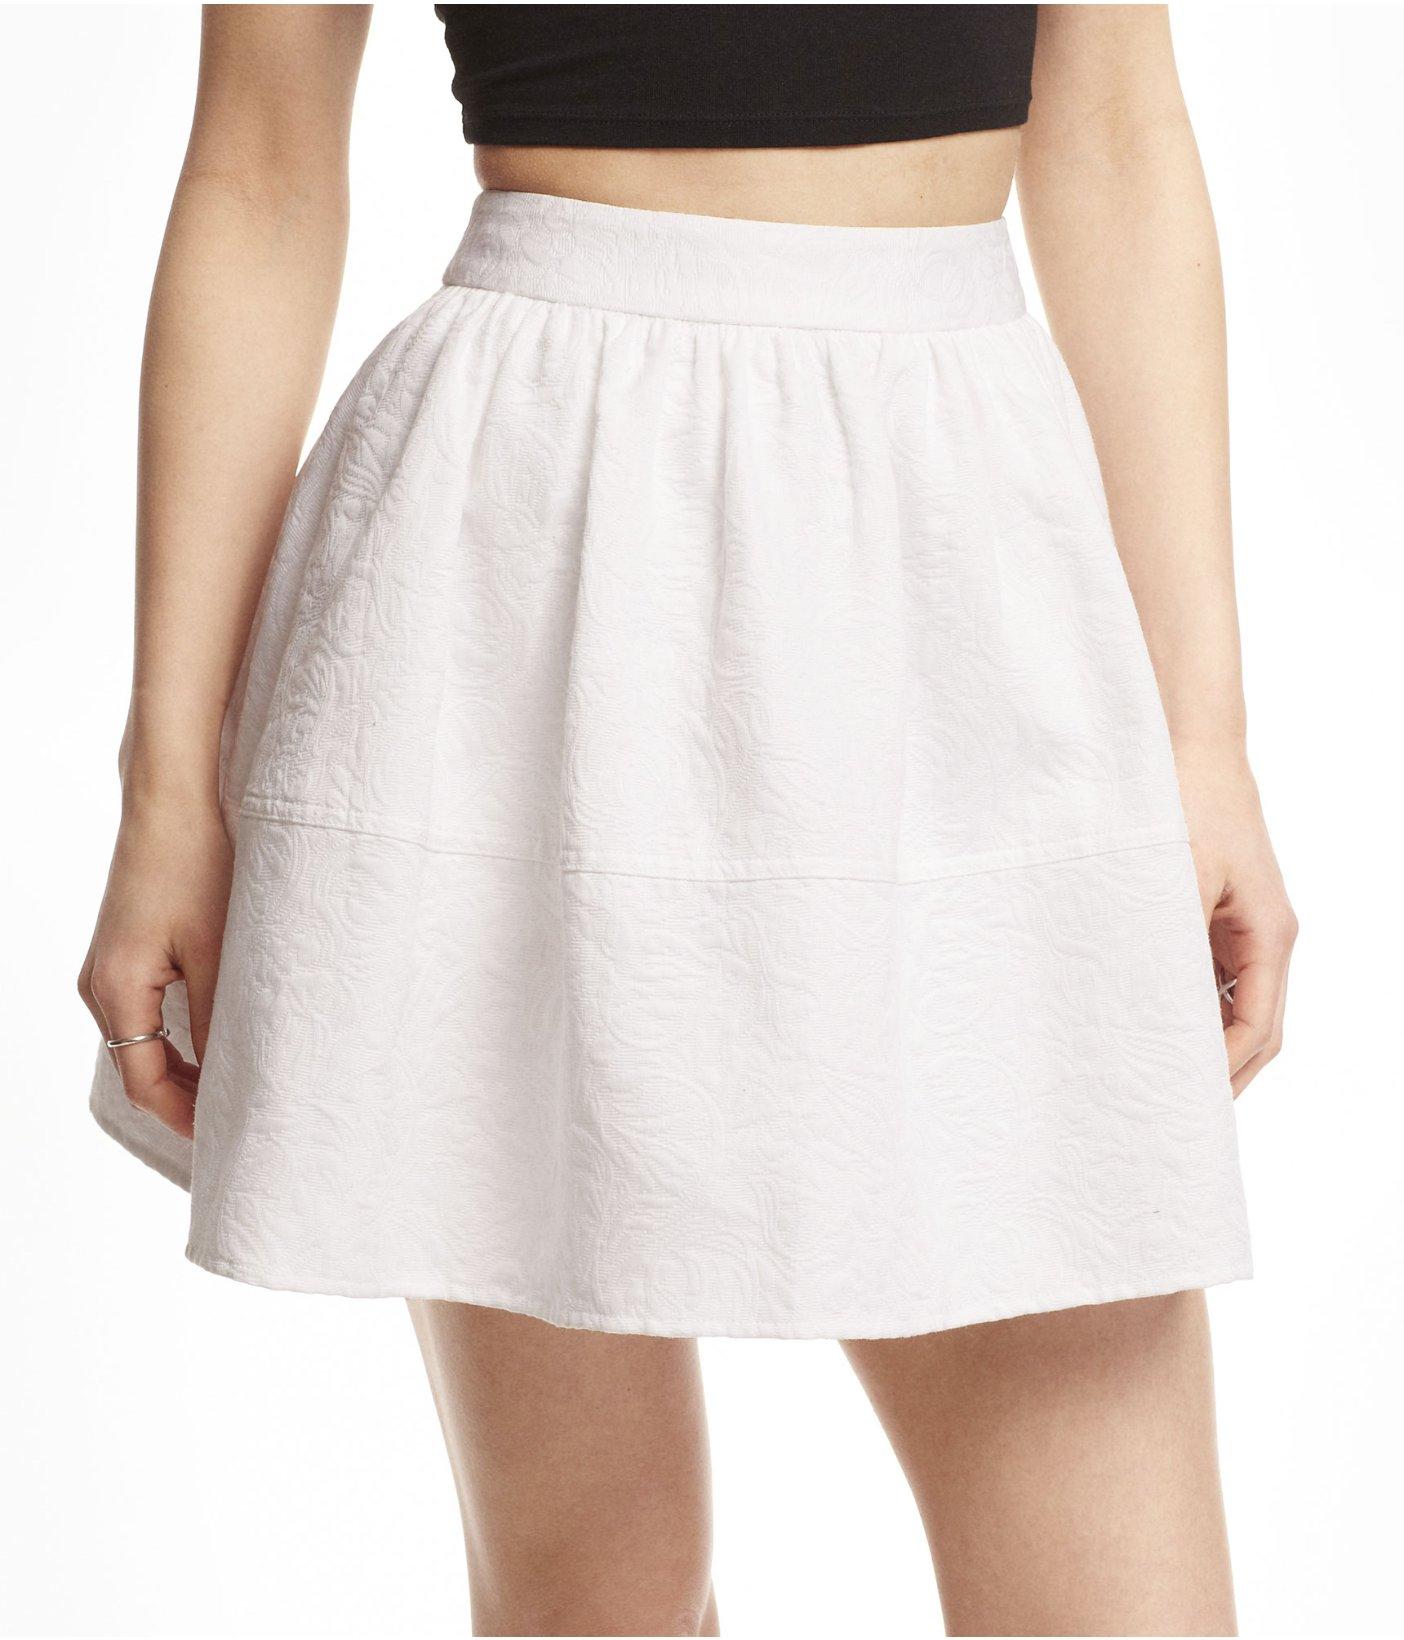 express high waist jacquard skirt in white lyst